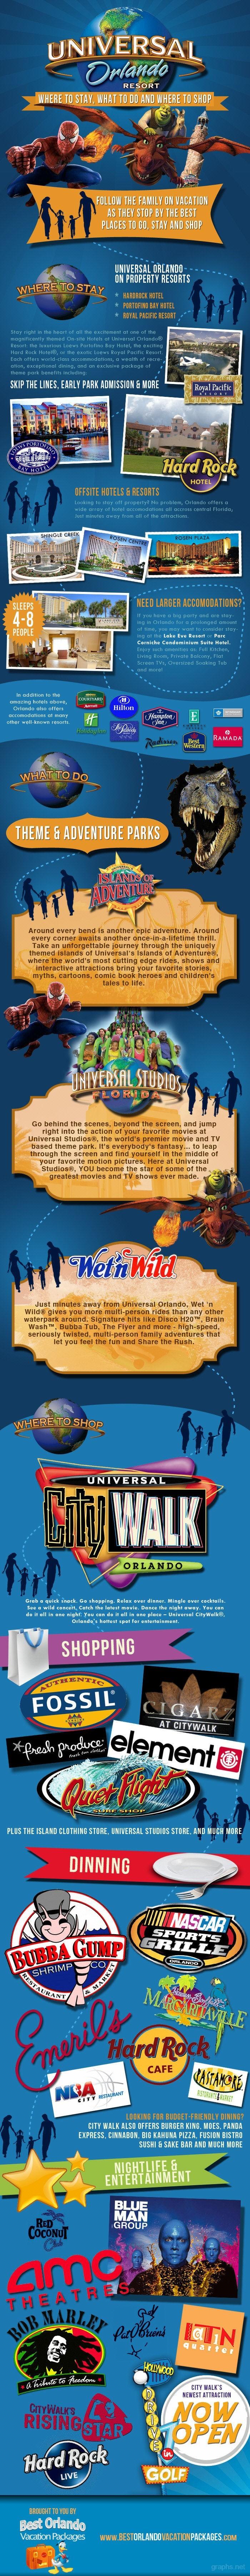 universal orlando facts